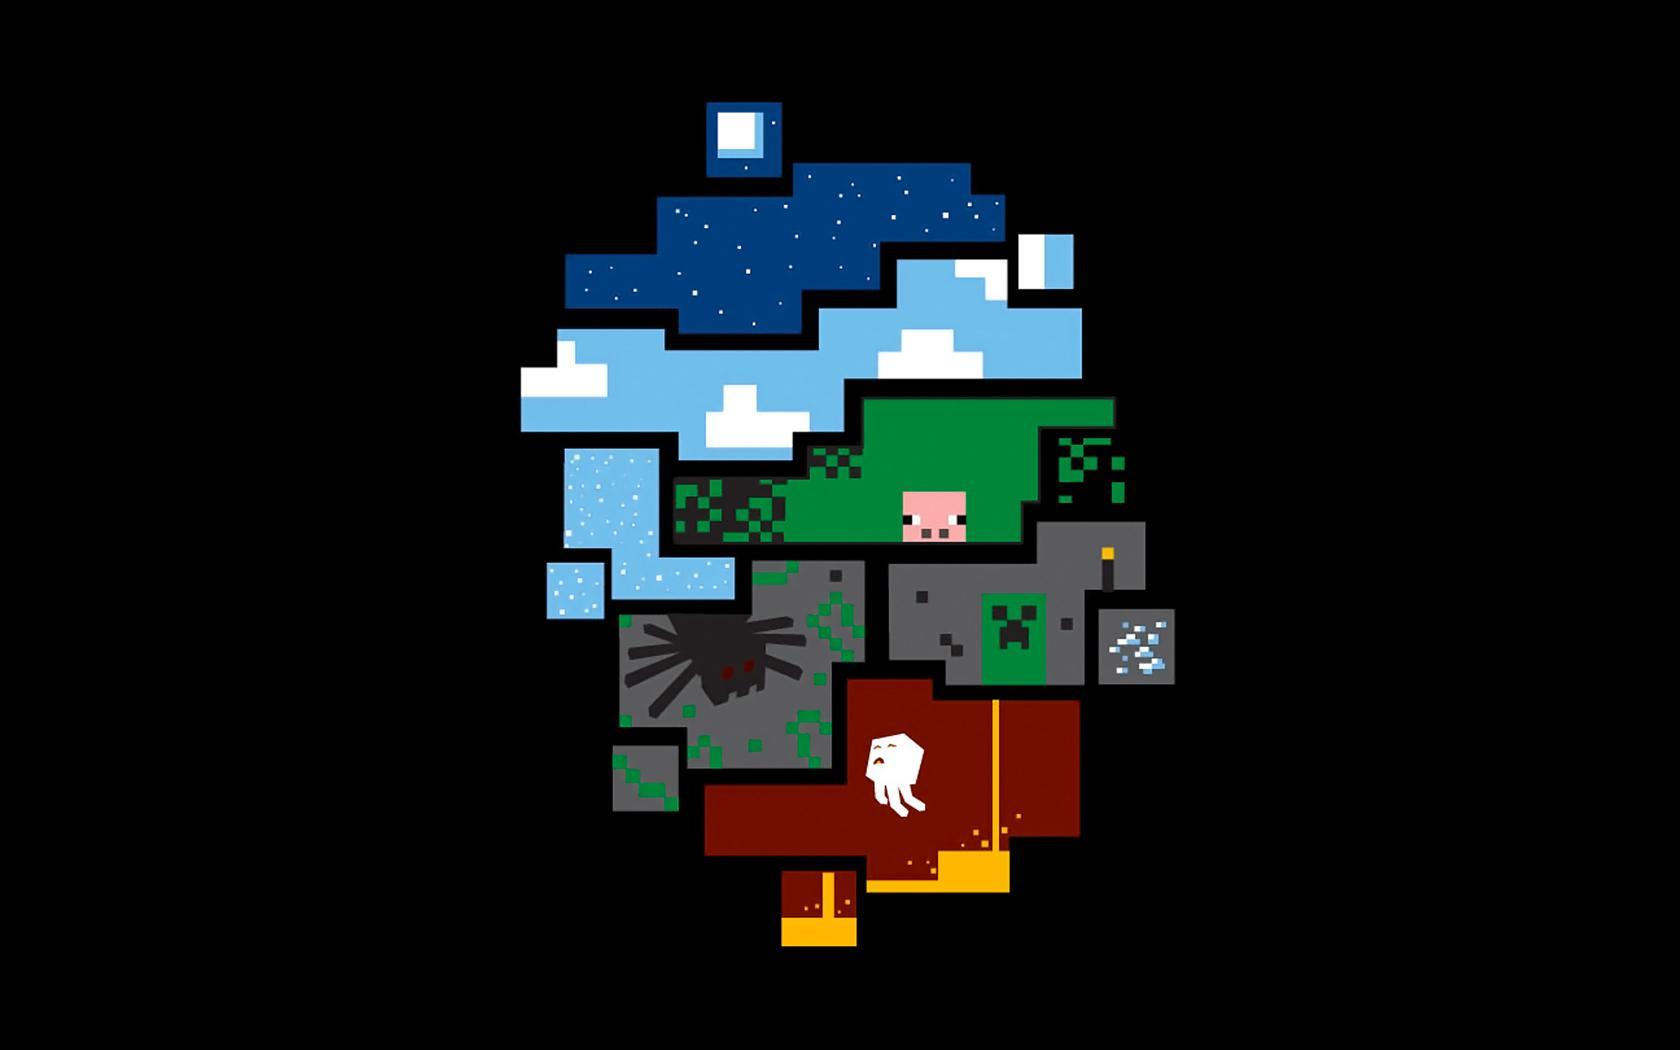 74+] Minecraft Wallpaper For Walls on WallpaperSafari.